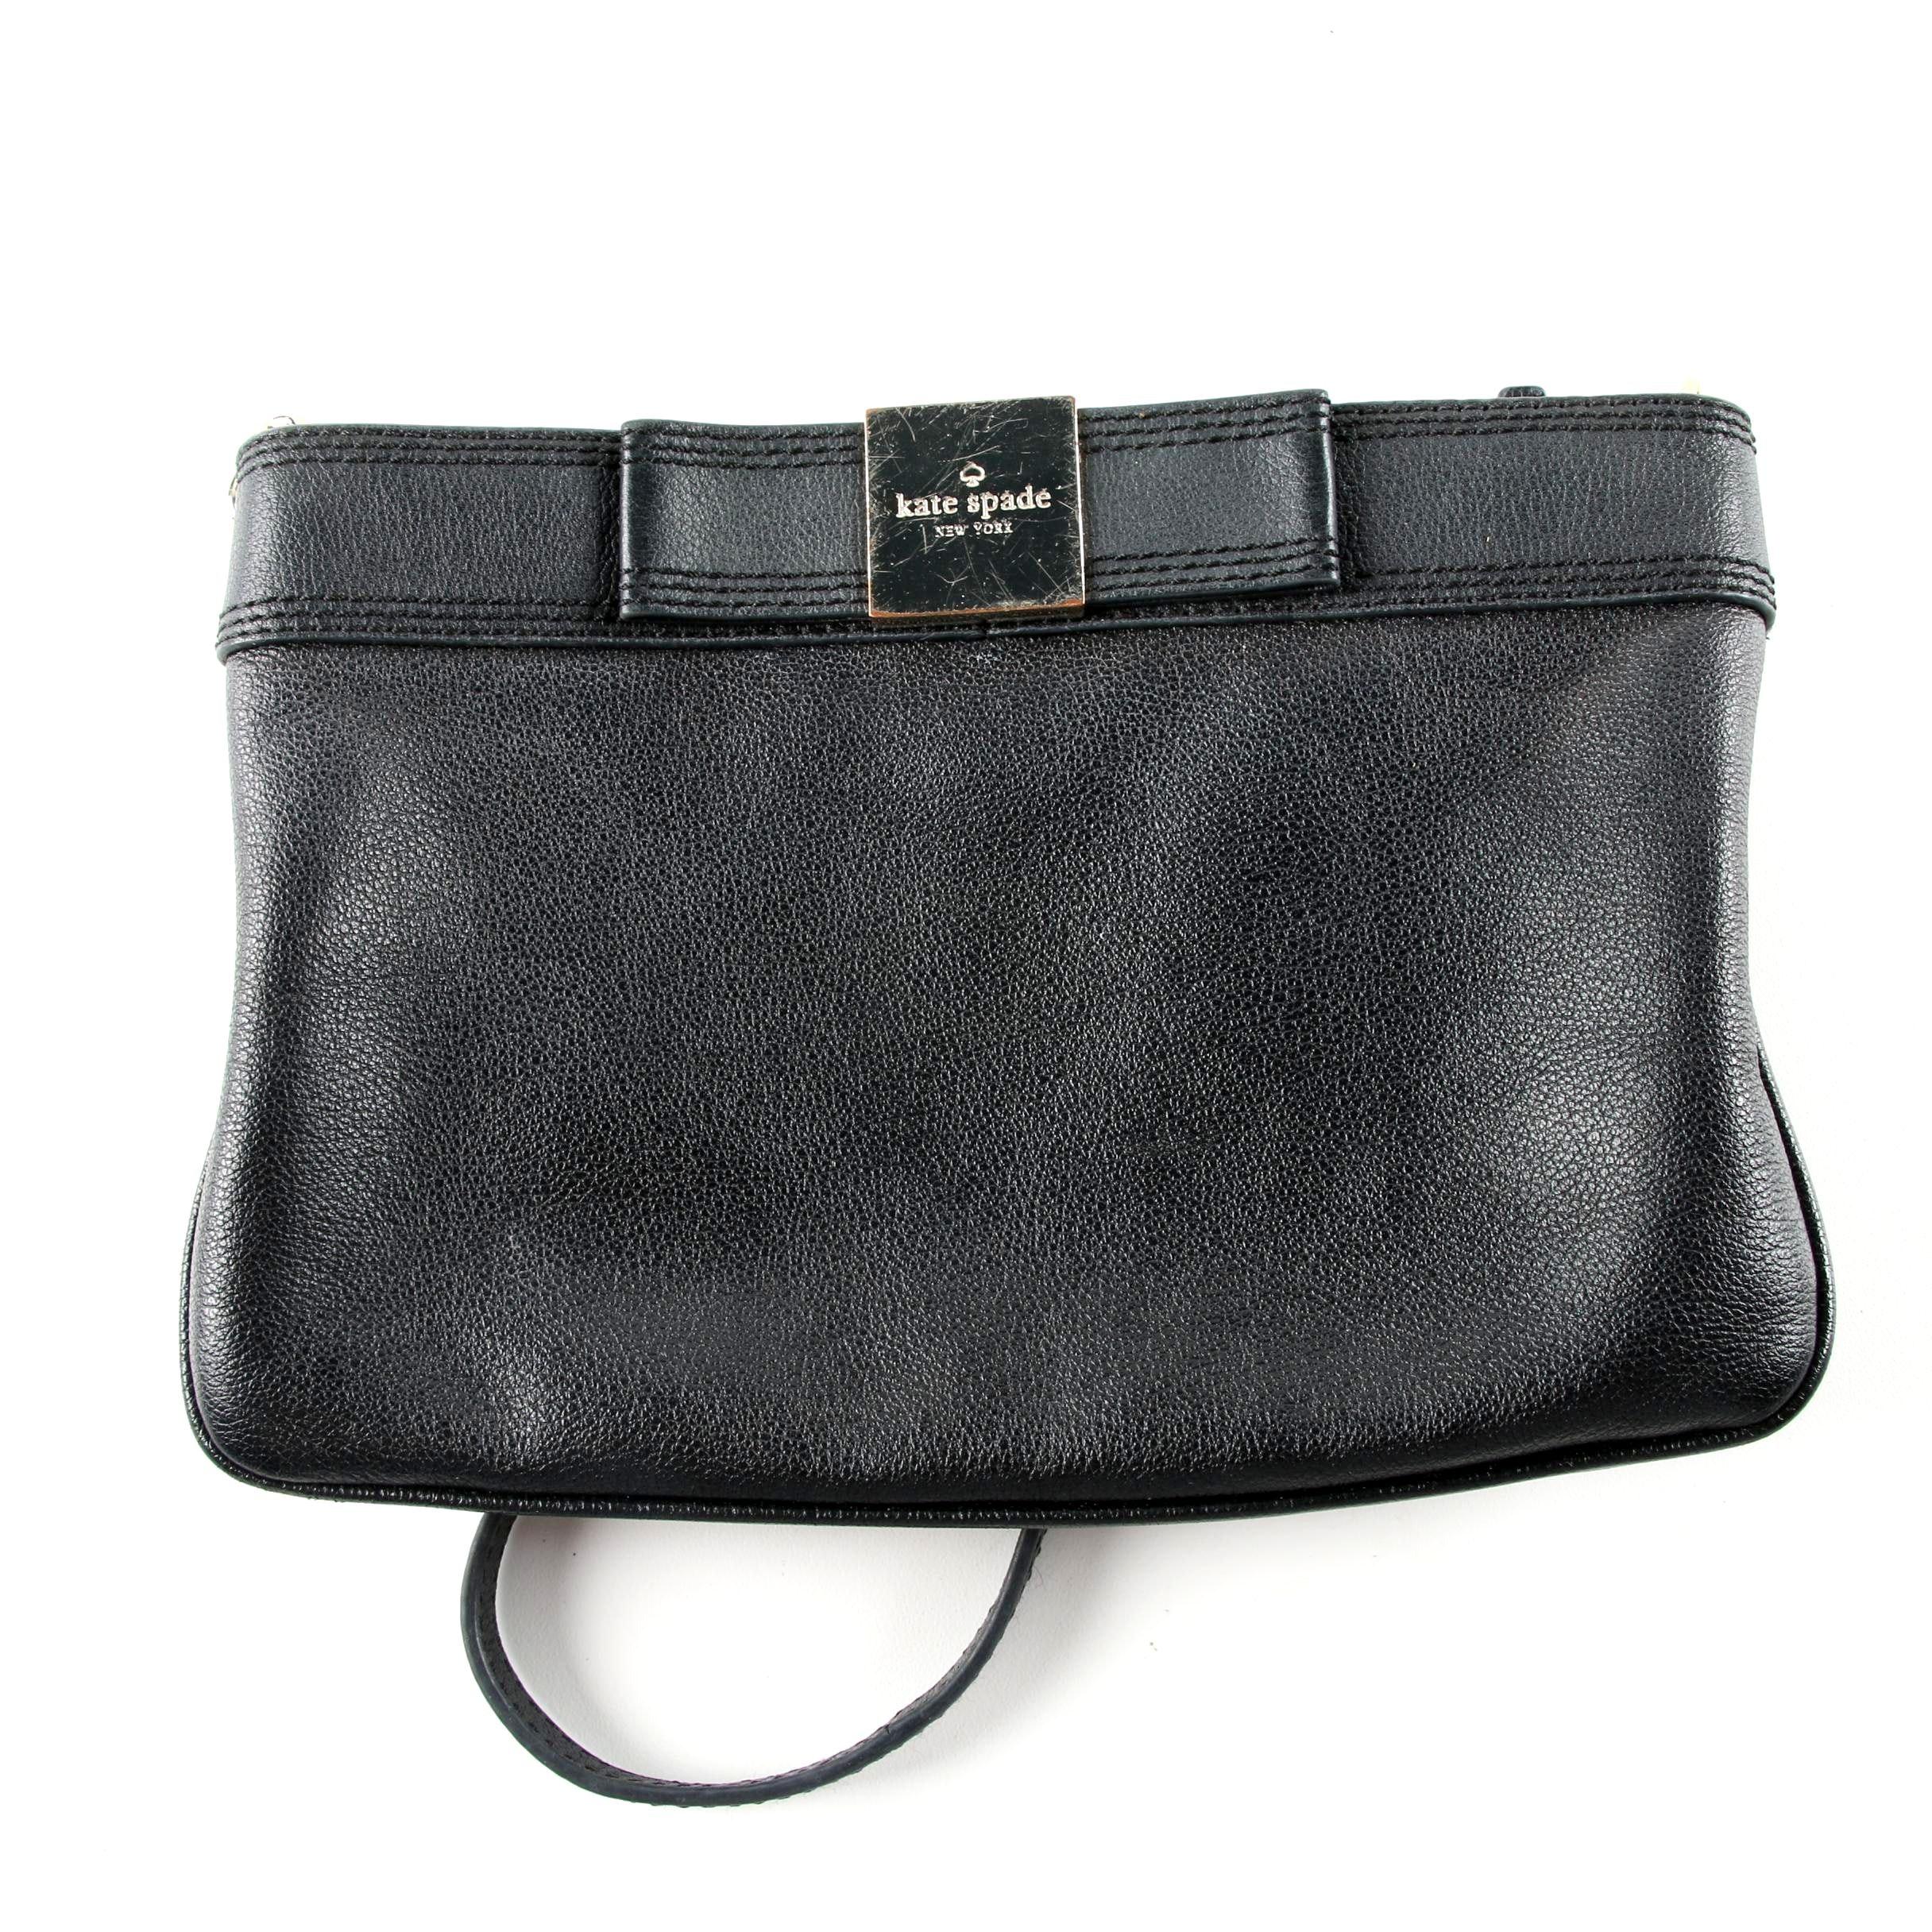 Kate Spade New York Black Leather Handbag